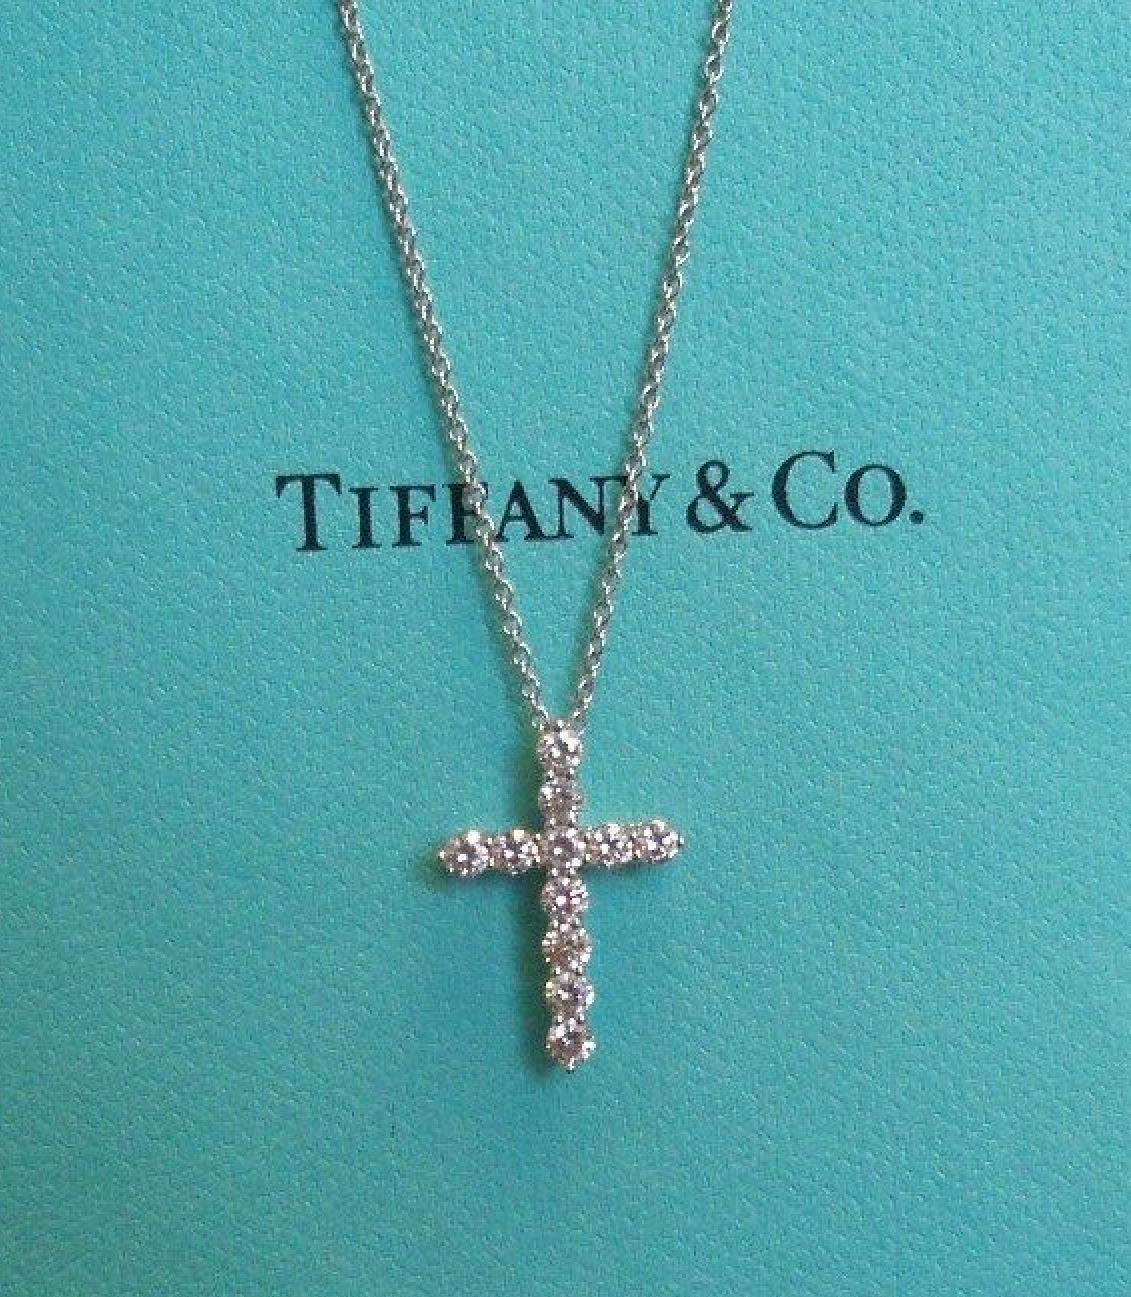 5fe739e9a Tiffany & Co. Cross pendant | Jewerly in 2019 | Tiffany jewelry ...